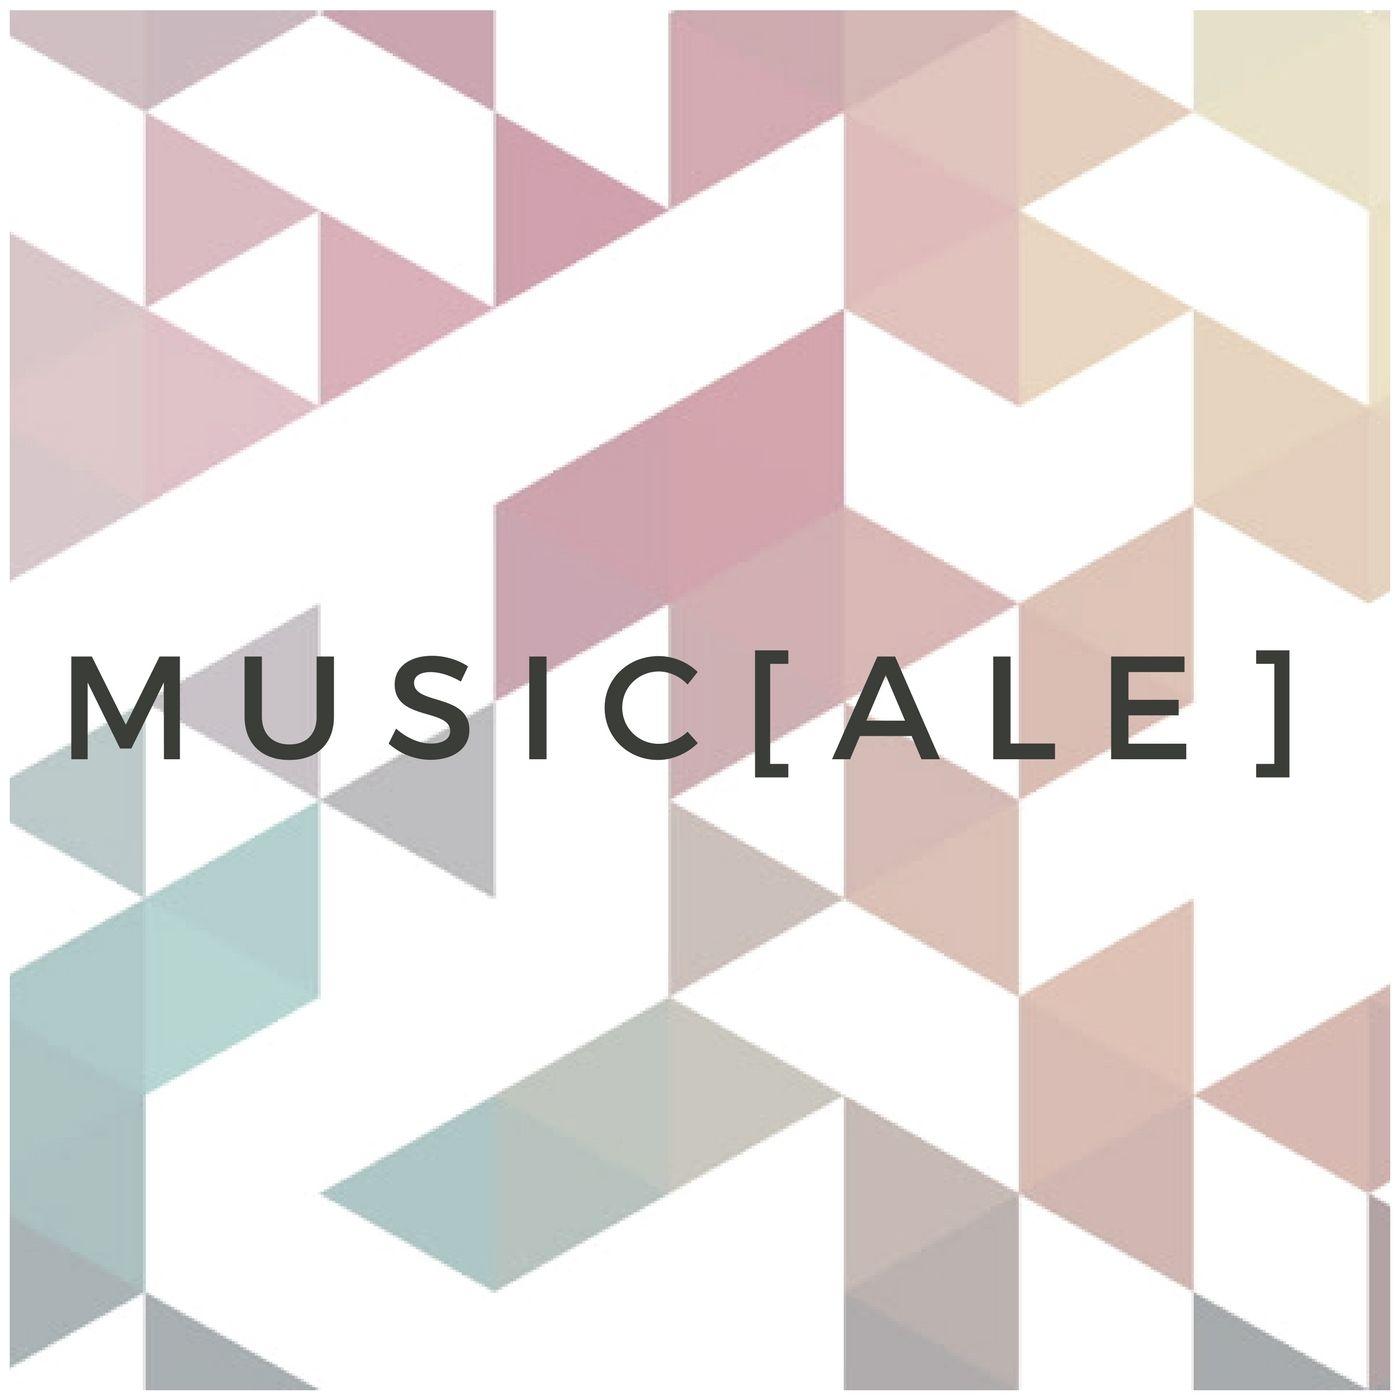 Musicale Imperatives